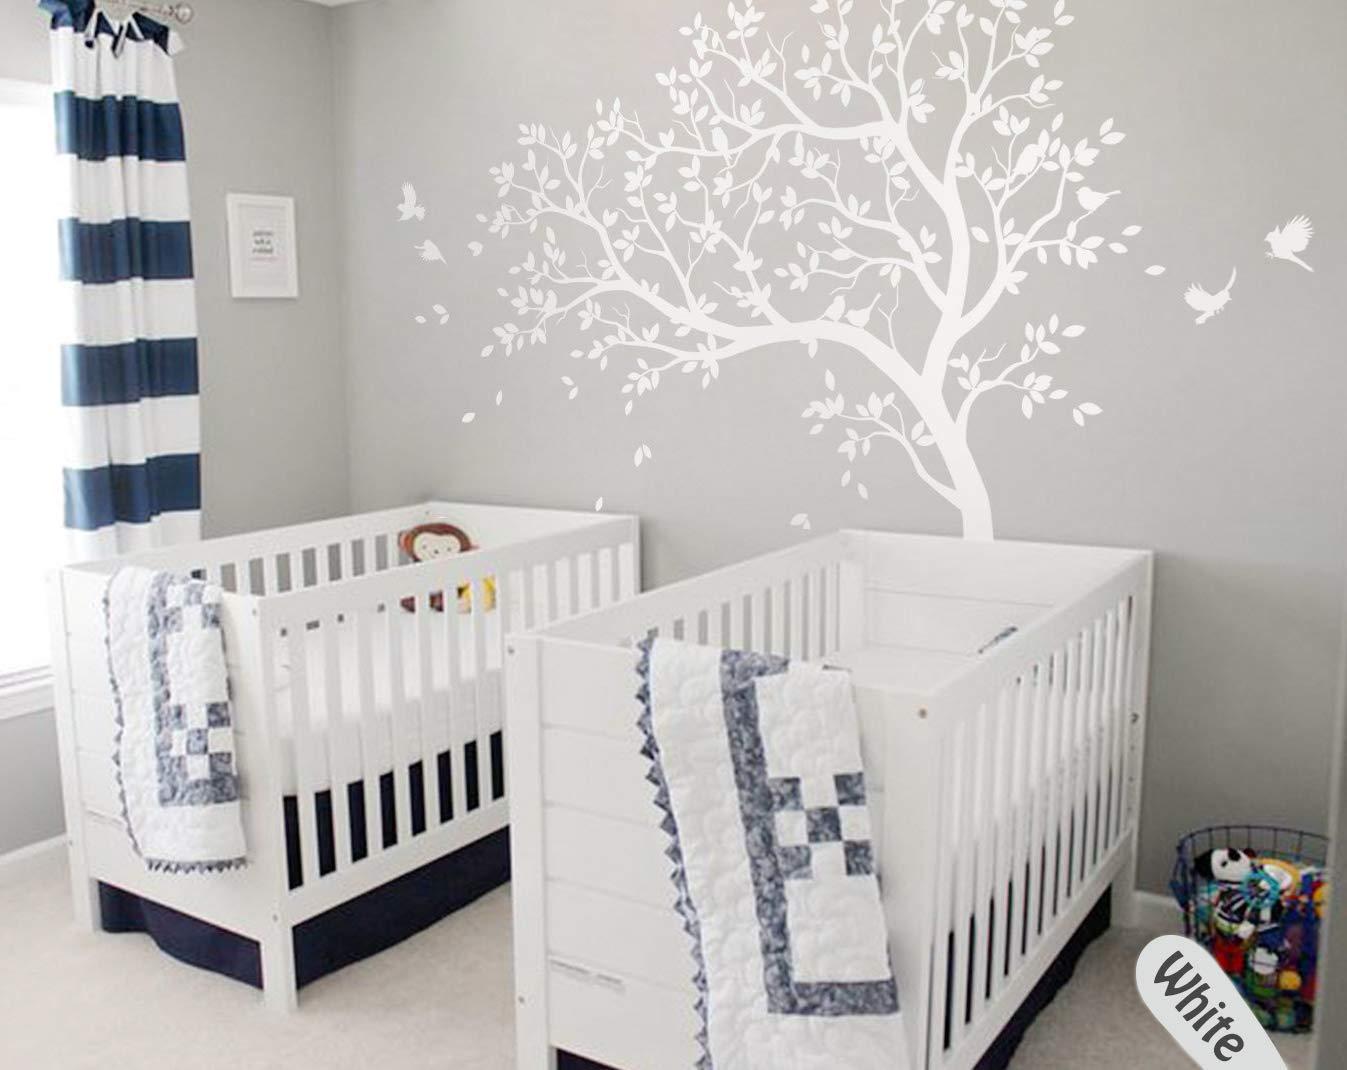 Amazon.com: Nursery White Tree Wall Decal Baby Room Tree Wall Mural Wall Decor Tattoo KW032: Handmade